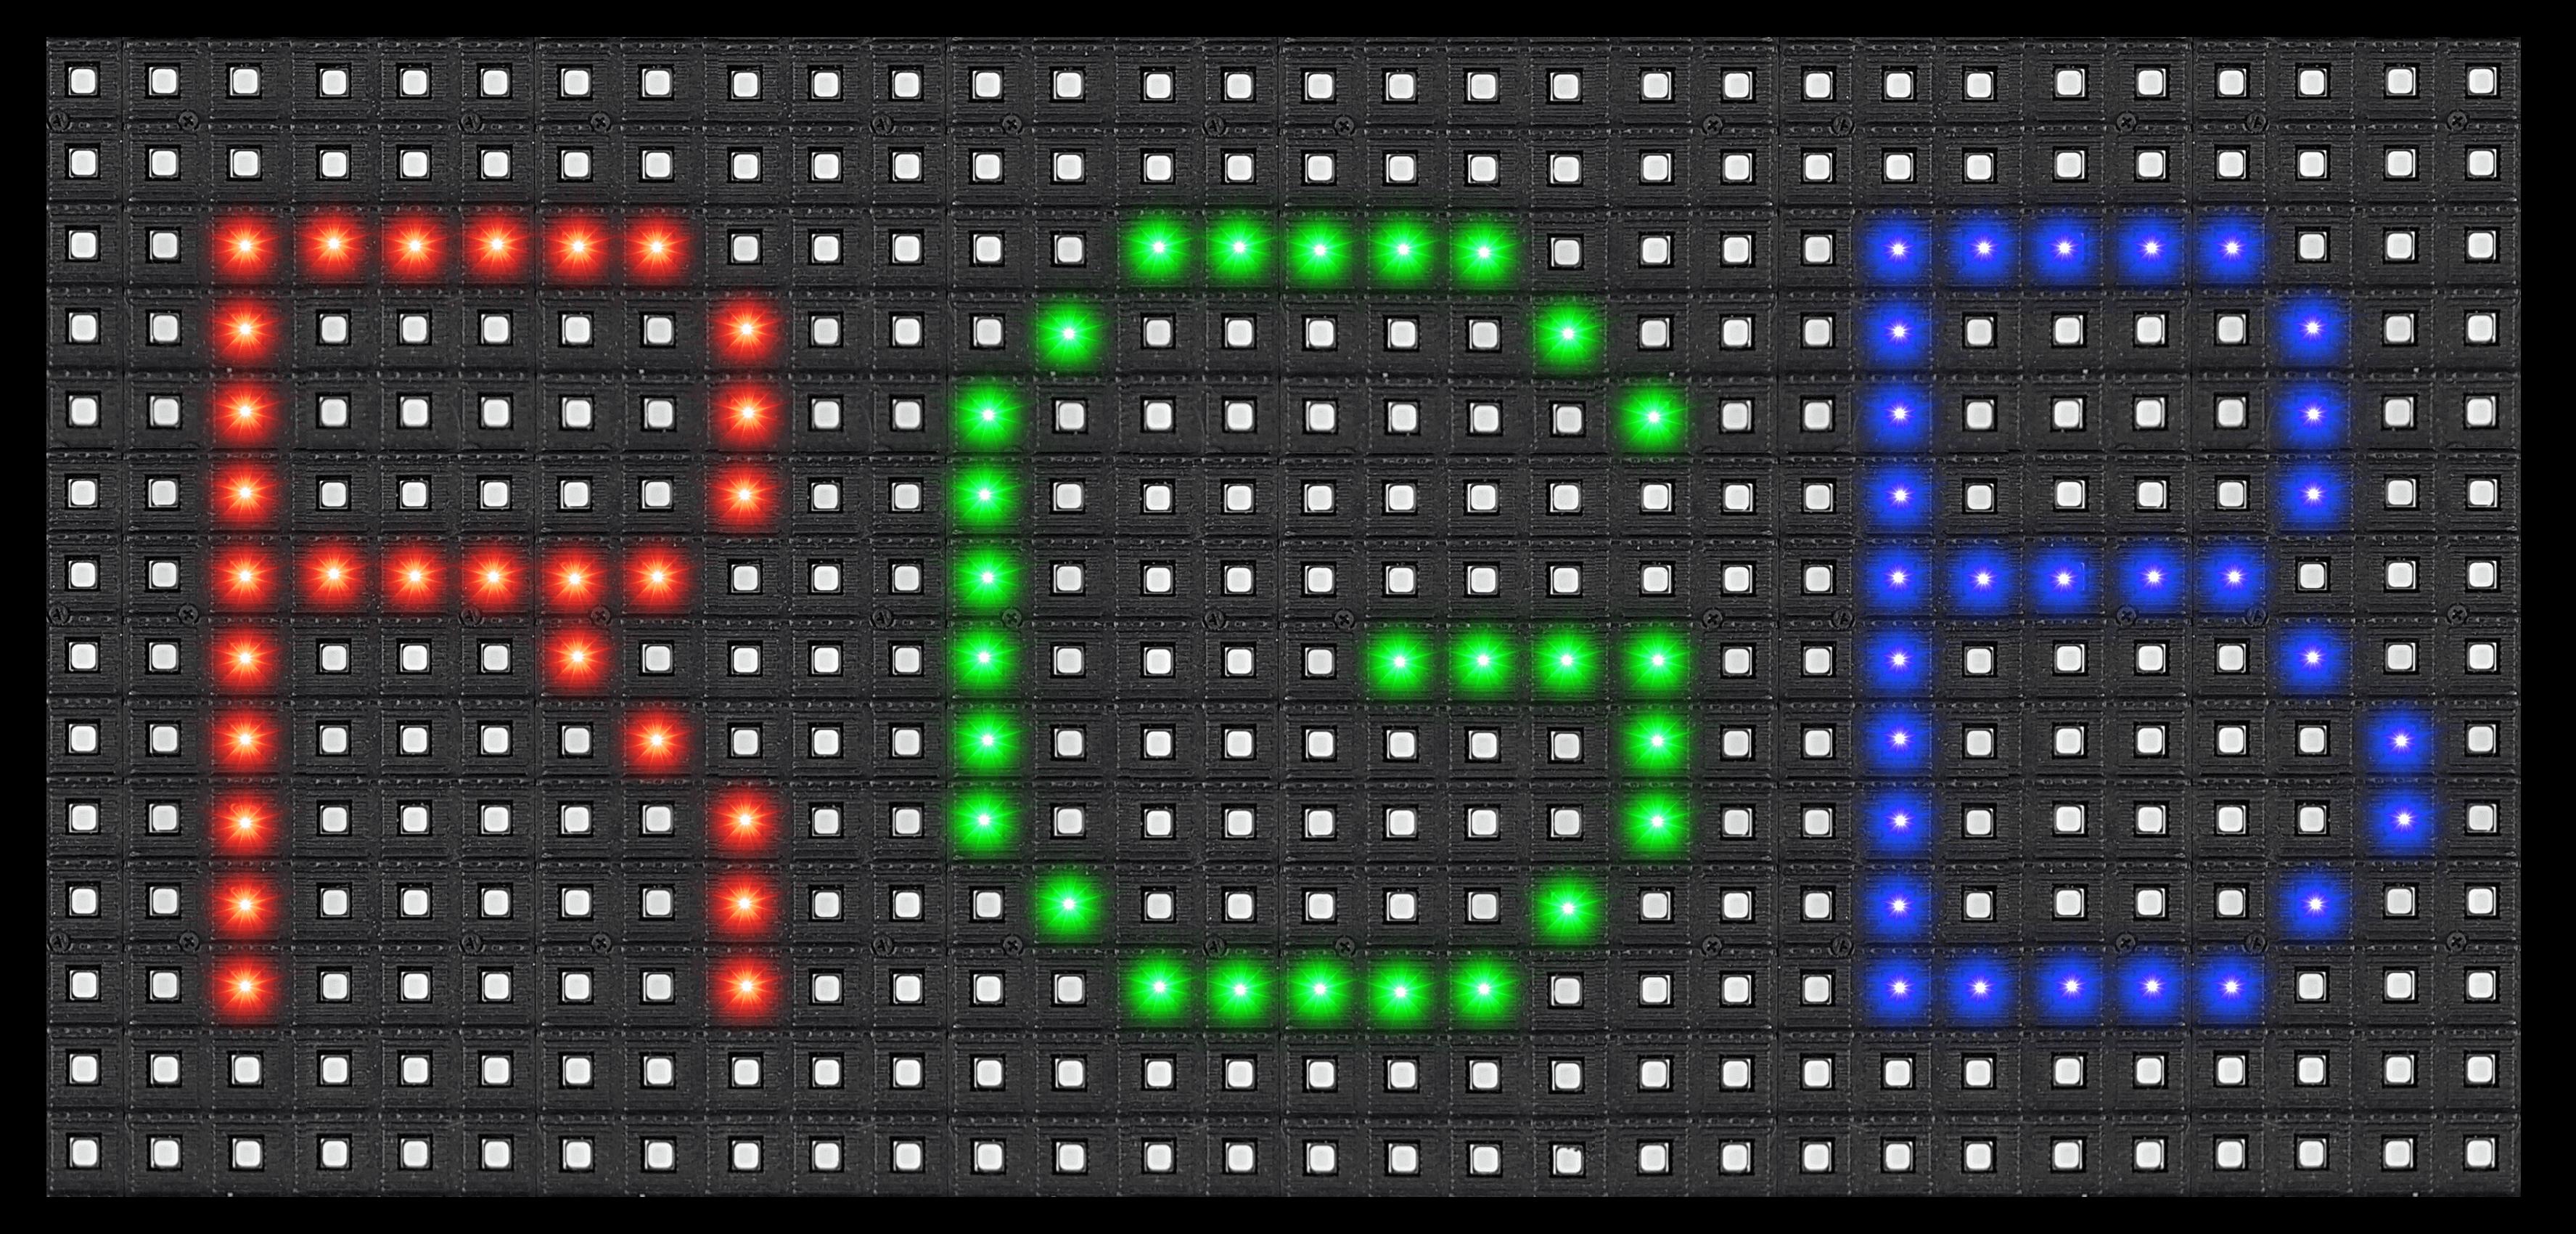 возможности LED экрана